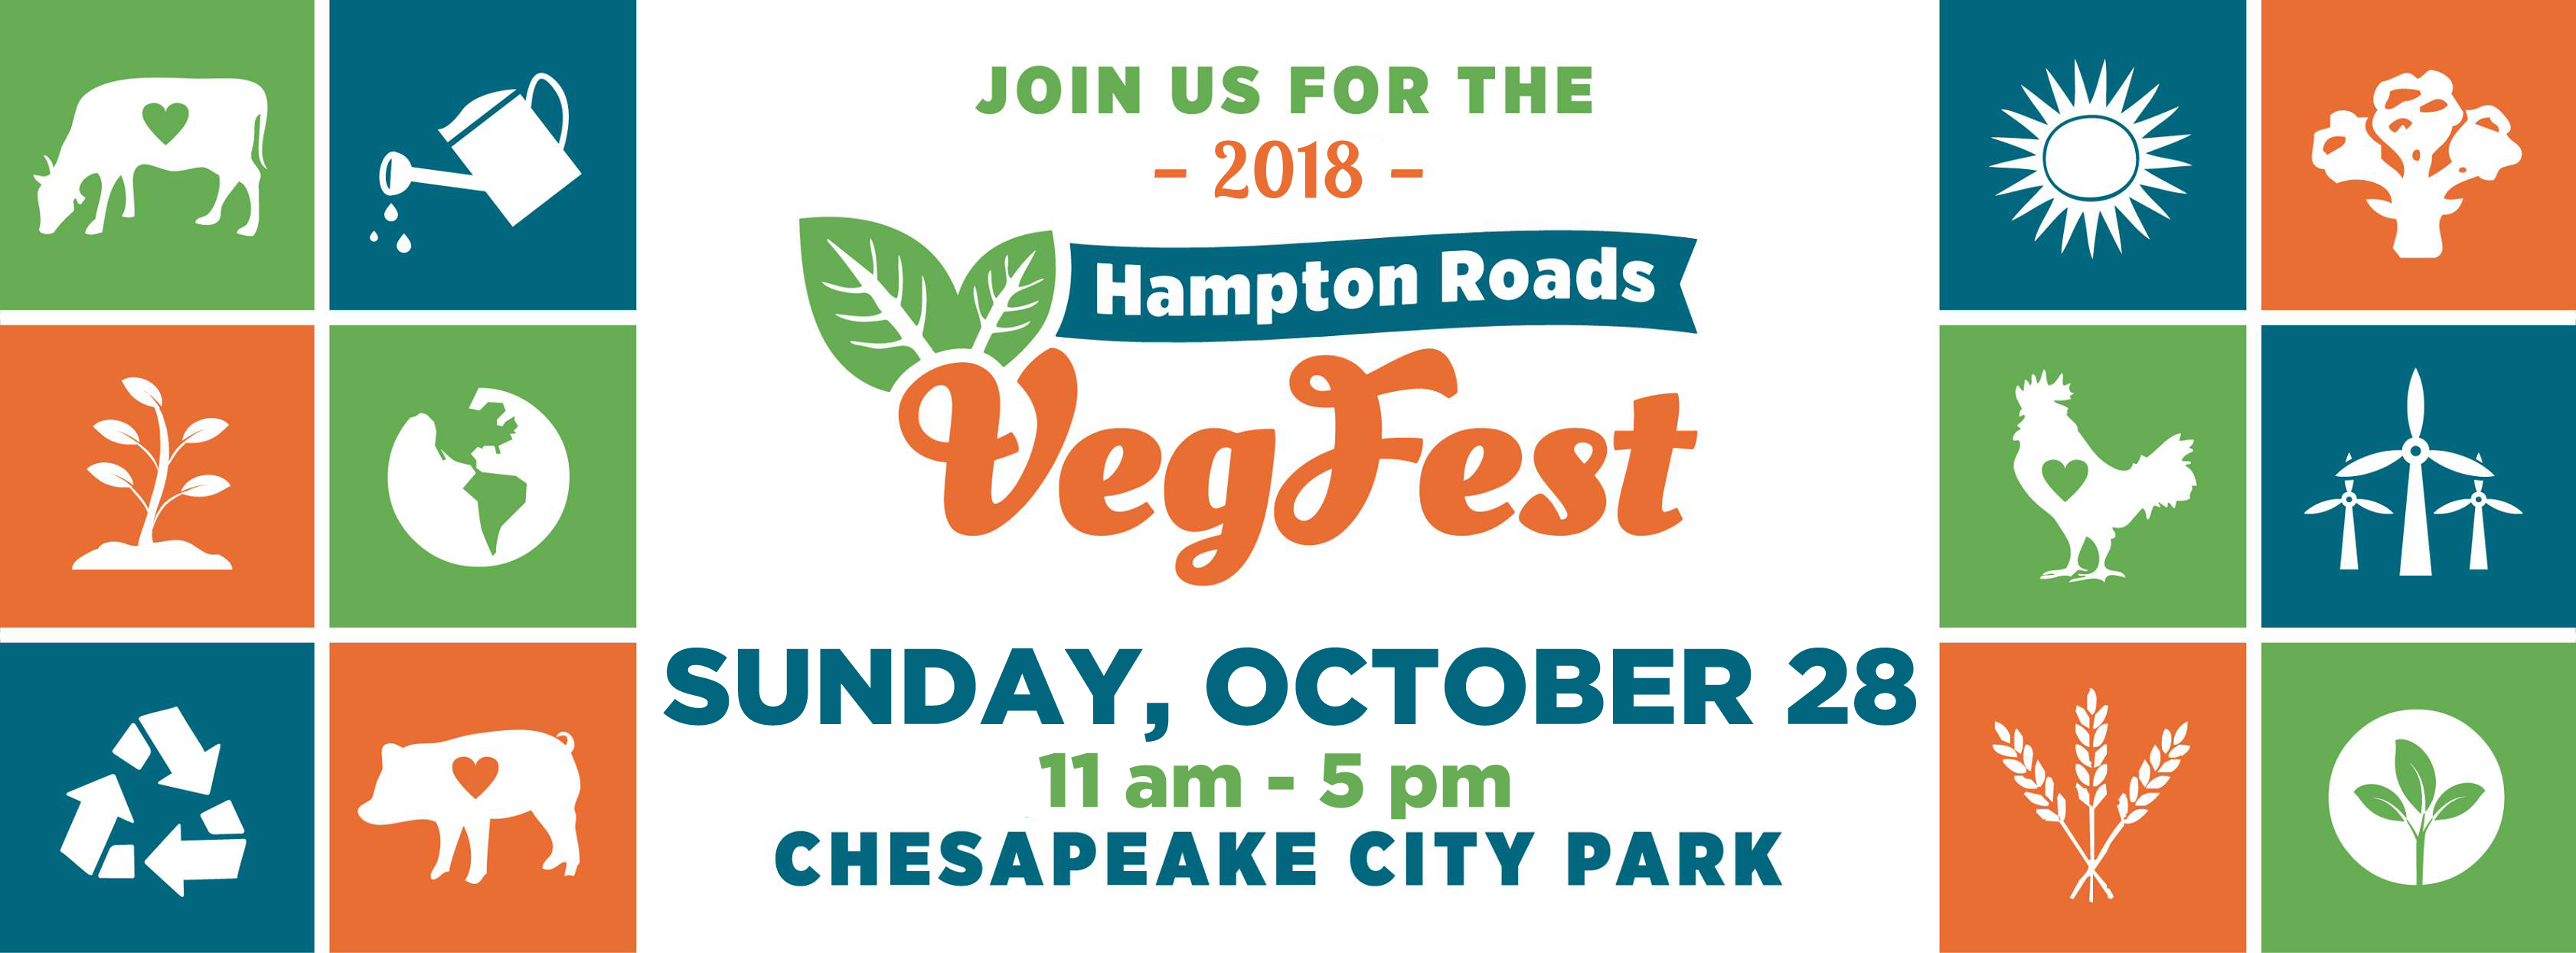 Announcing the 2018 Hampton Roads VegFest!